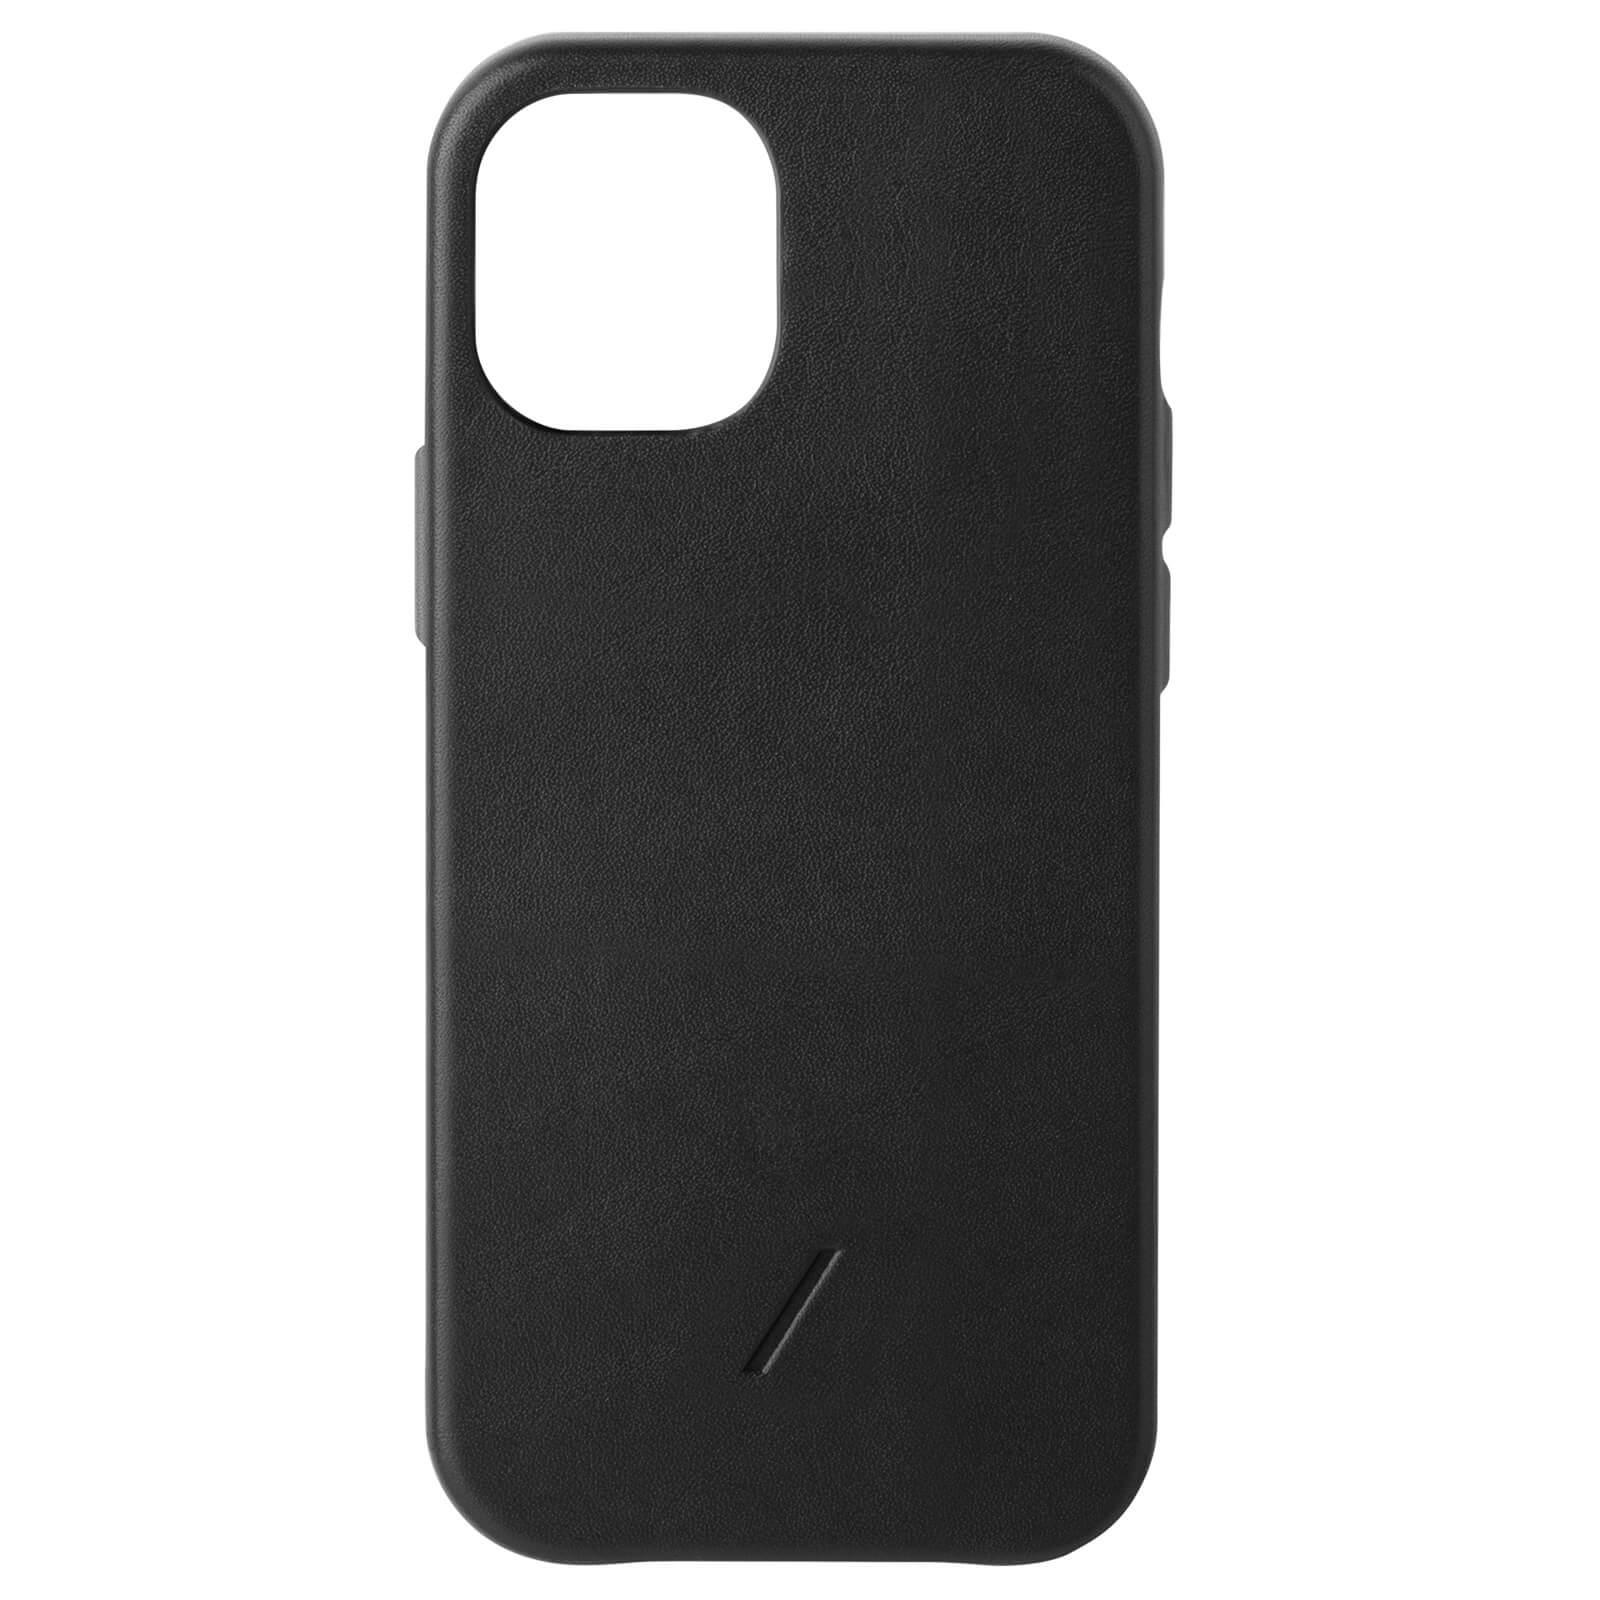 Native Union Clic Classic iPhone Case - Black - iPhone 12/12 Pro